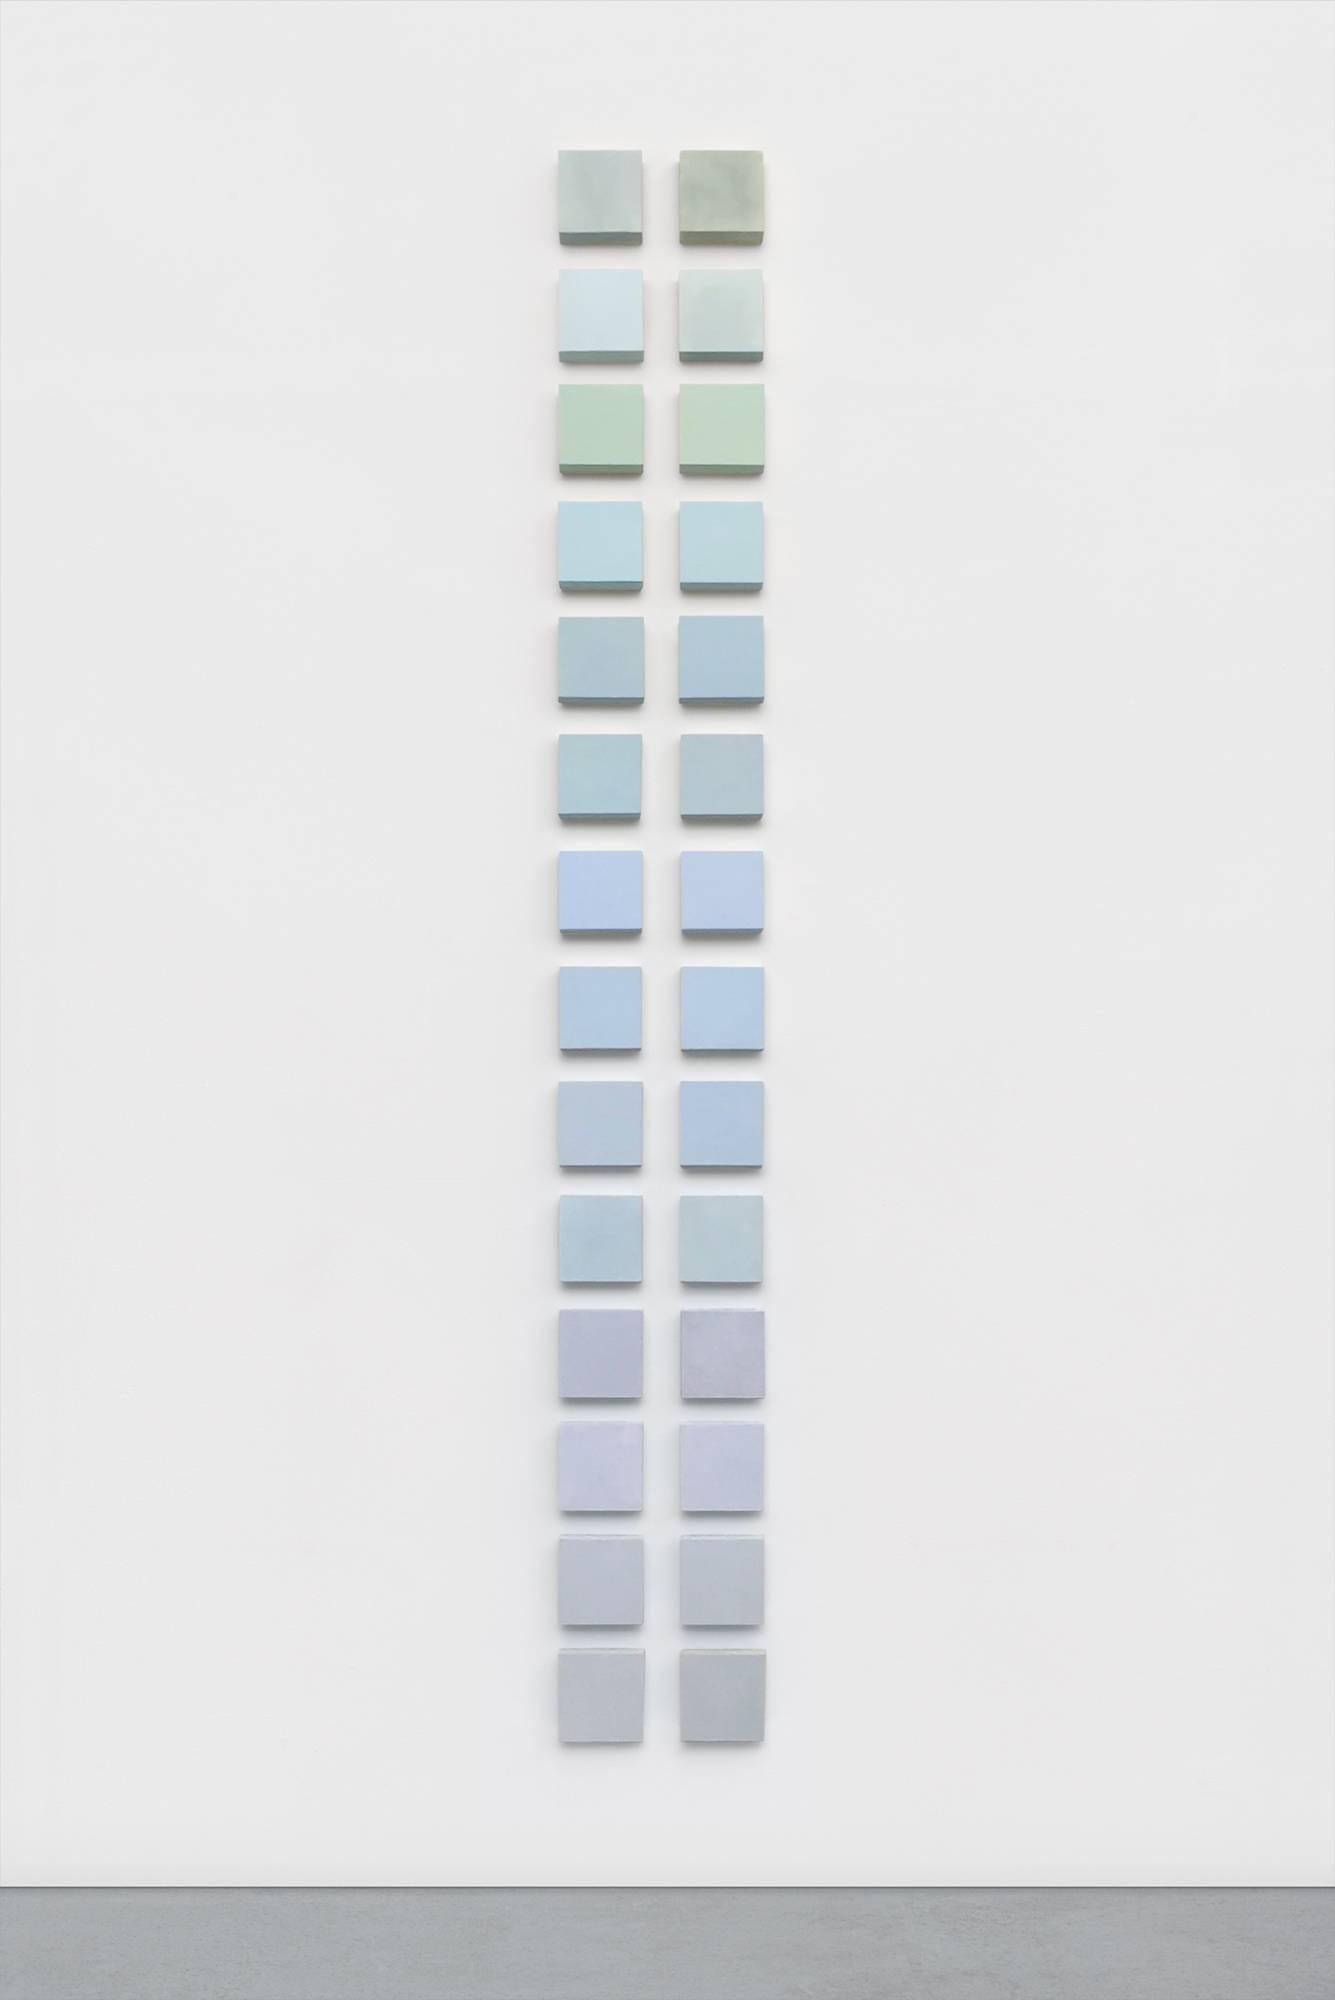 Mel Prest, Fog Trellis, 2018, acrylic paint and mica